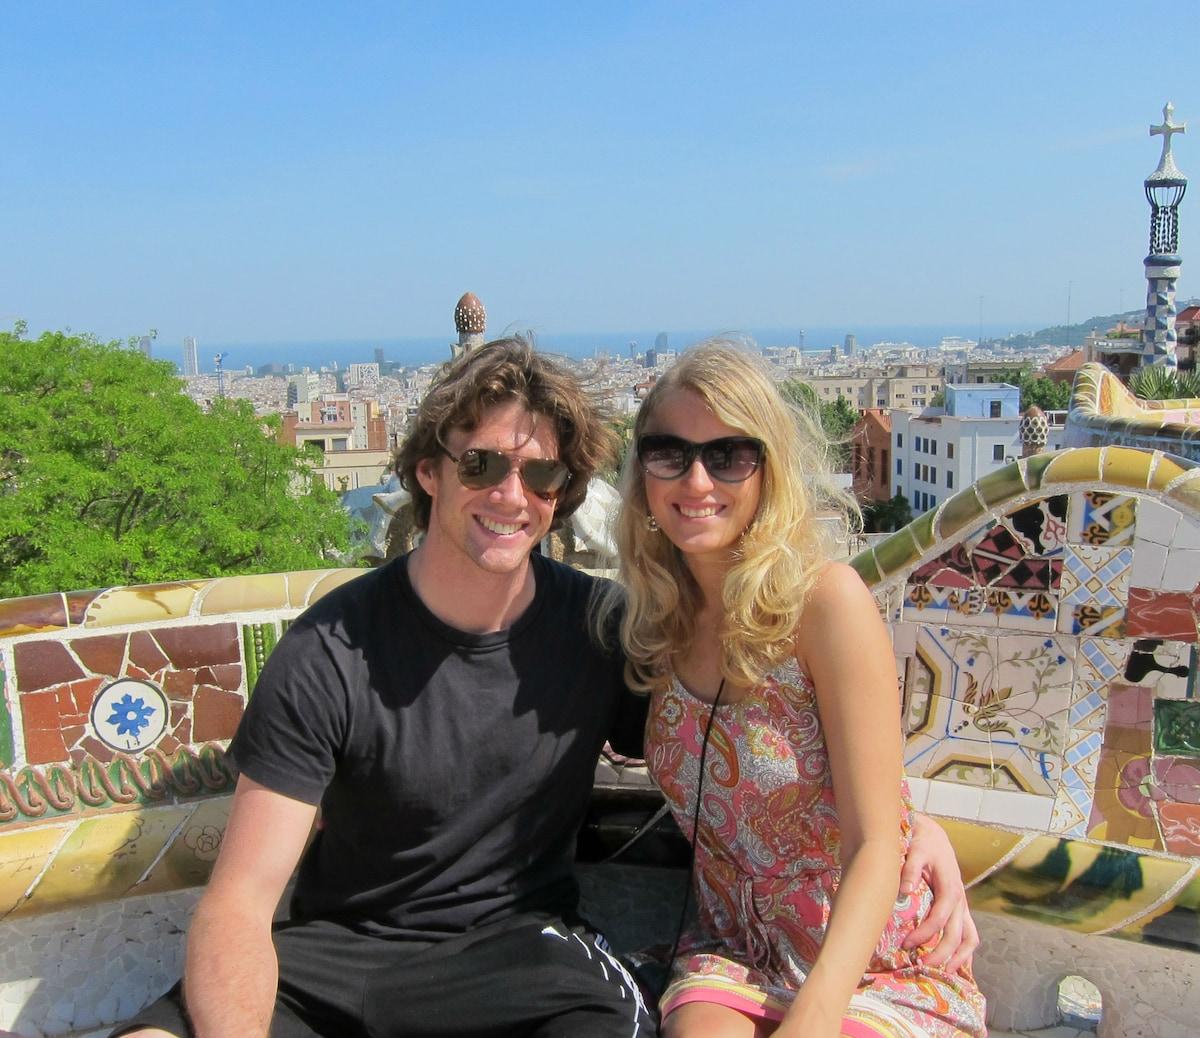 Ryan & Anna from Santa Cruz